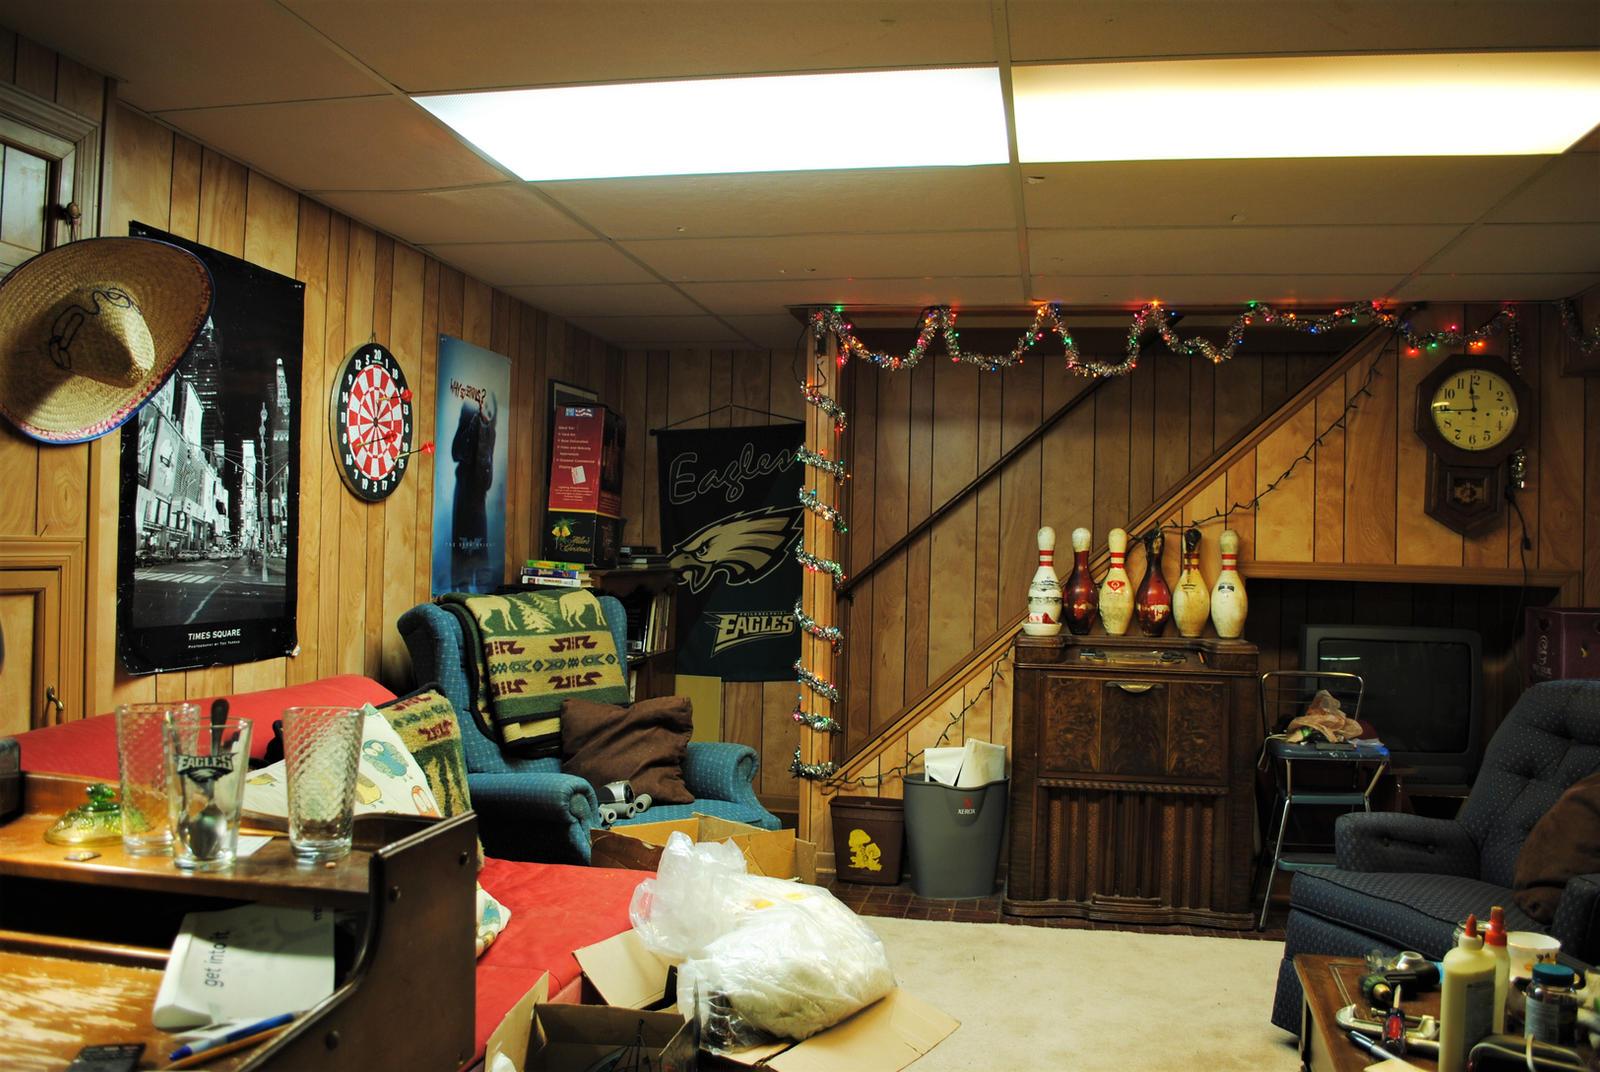 1980's Basement Rec Room by BardaWolf on DeviantArt